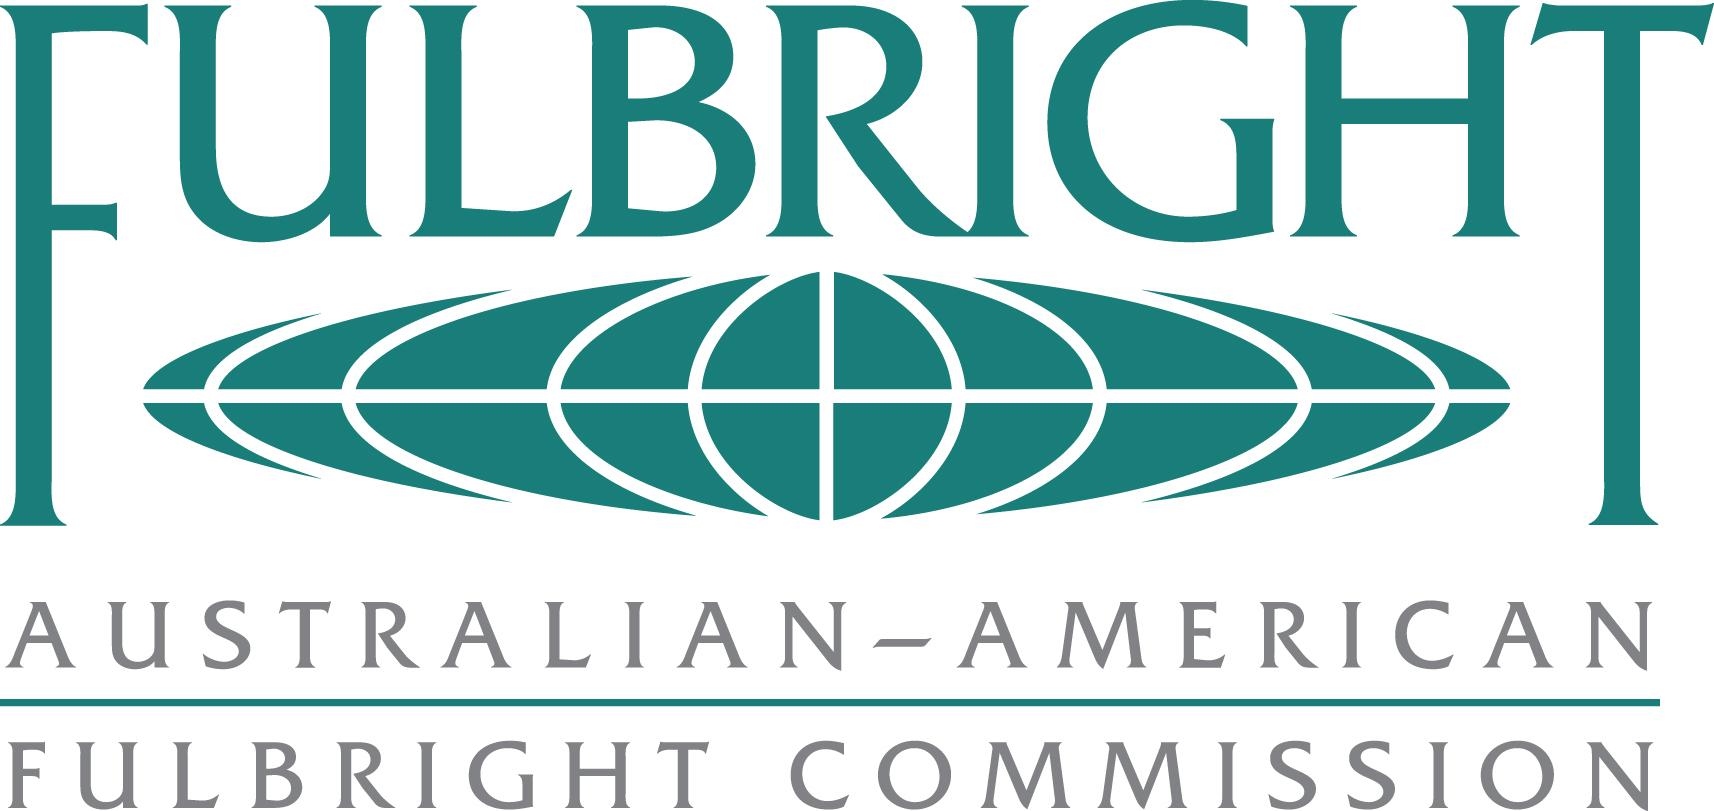 Copy of Australian-American Fulbright